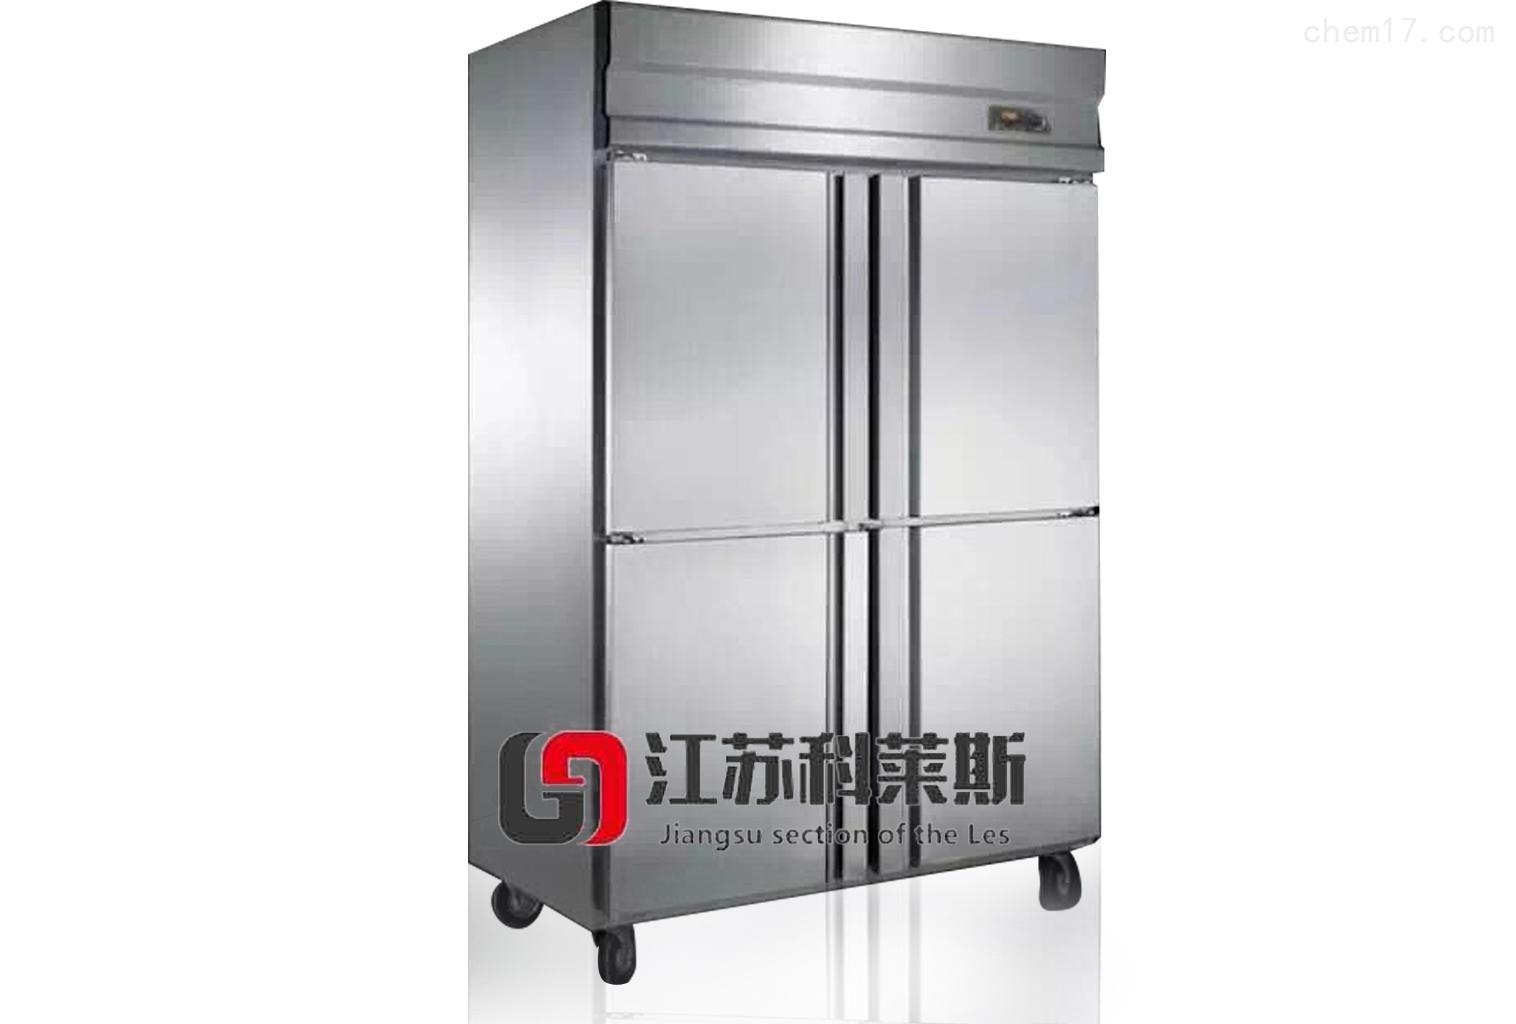 kls-018軸承鋼深冷處理